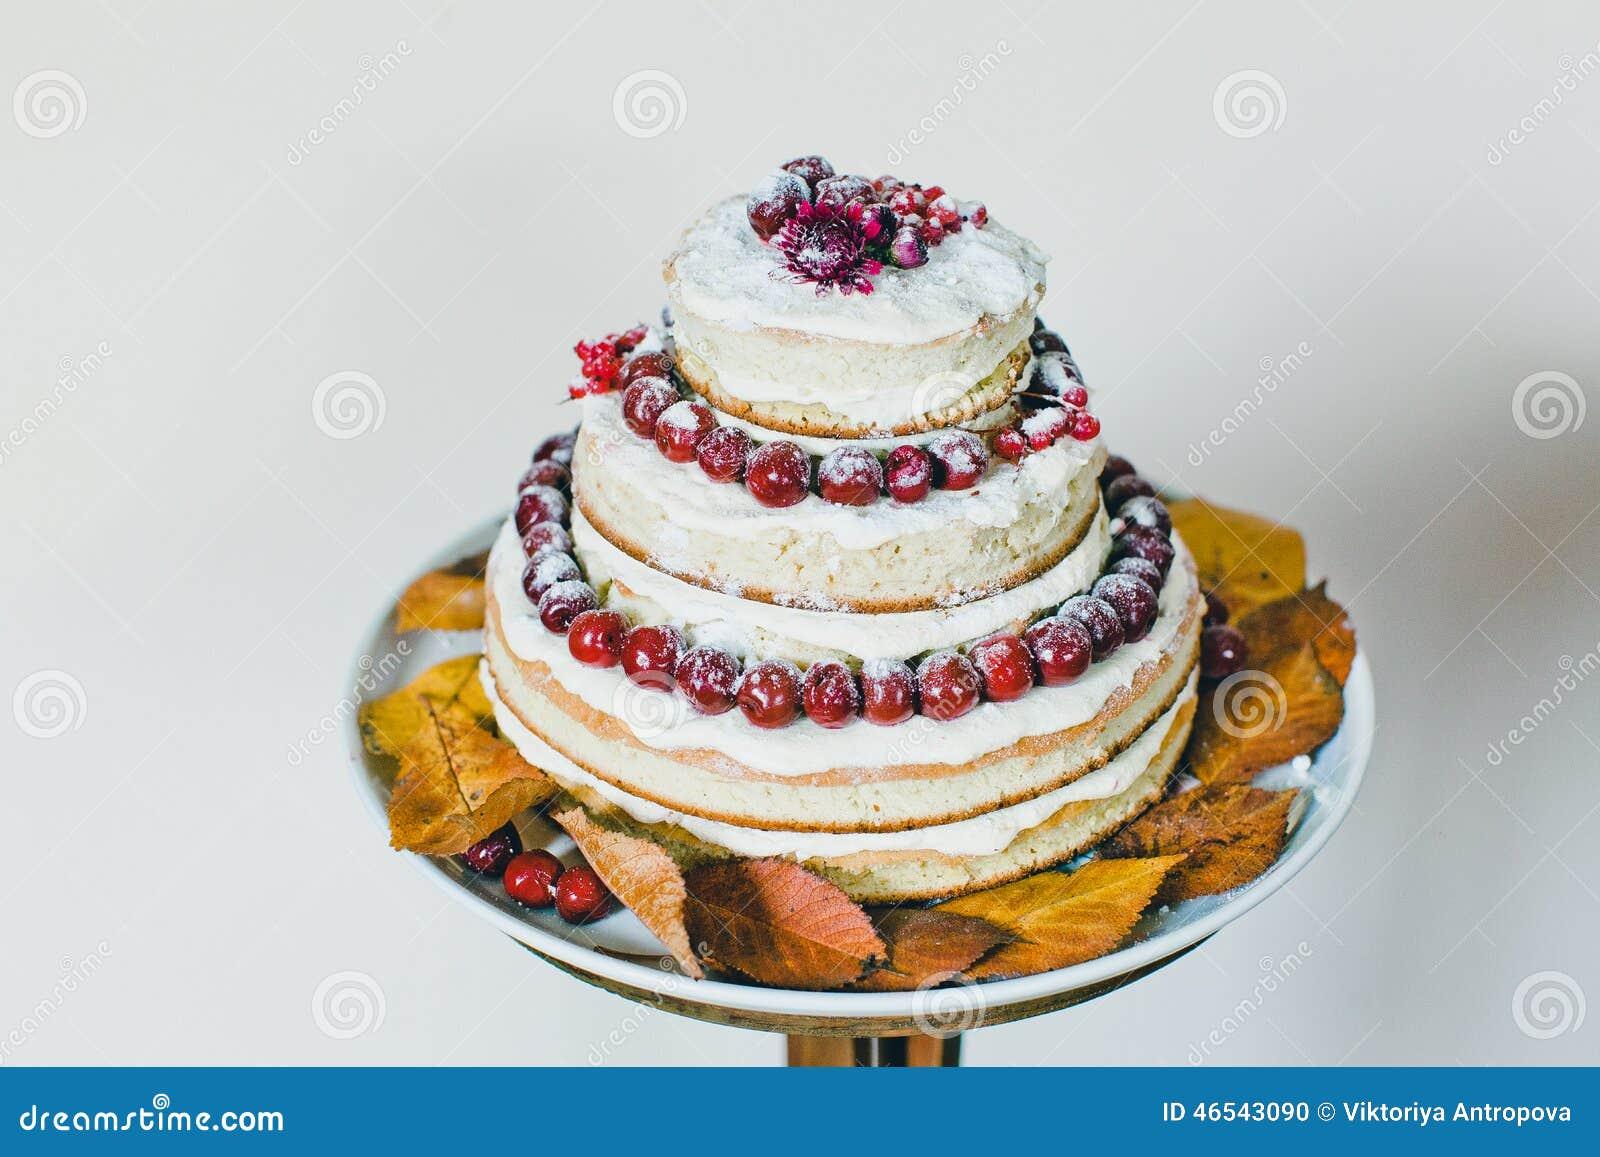 Wedding cake stock photo. Image of cherries, autumn, cakes - 46543090